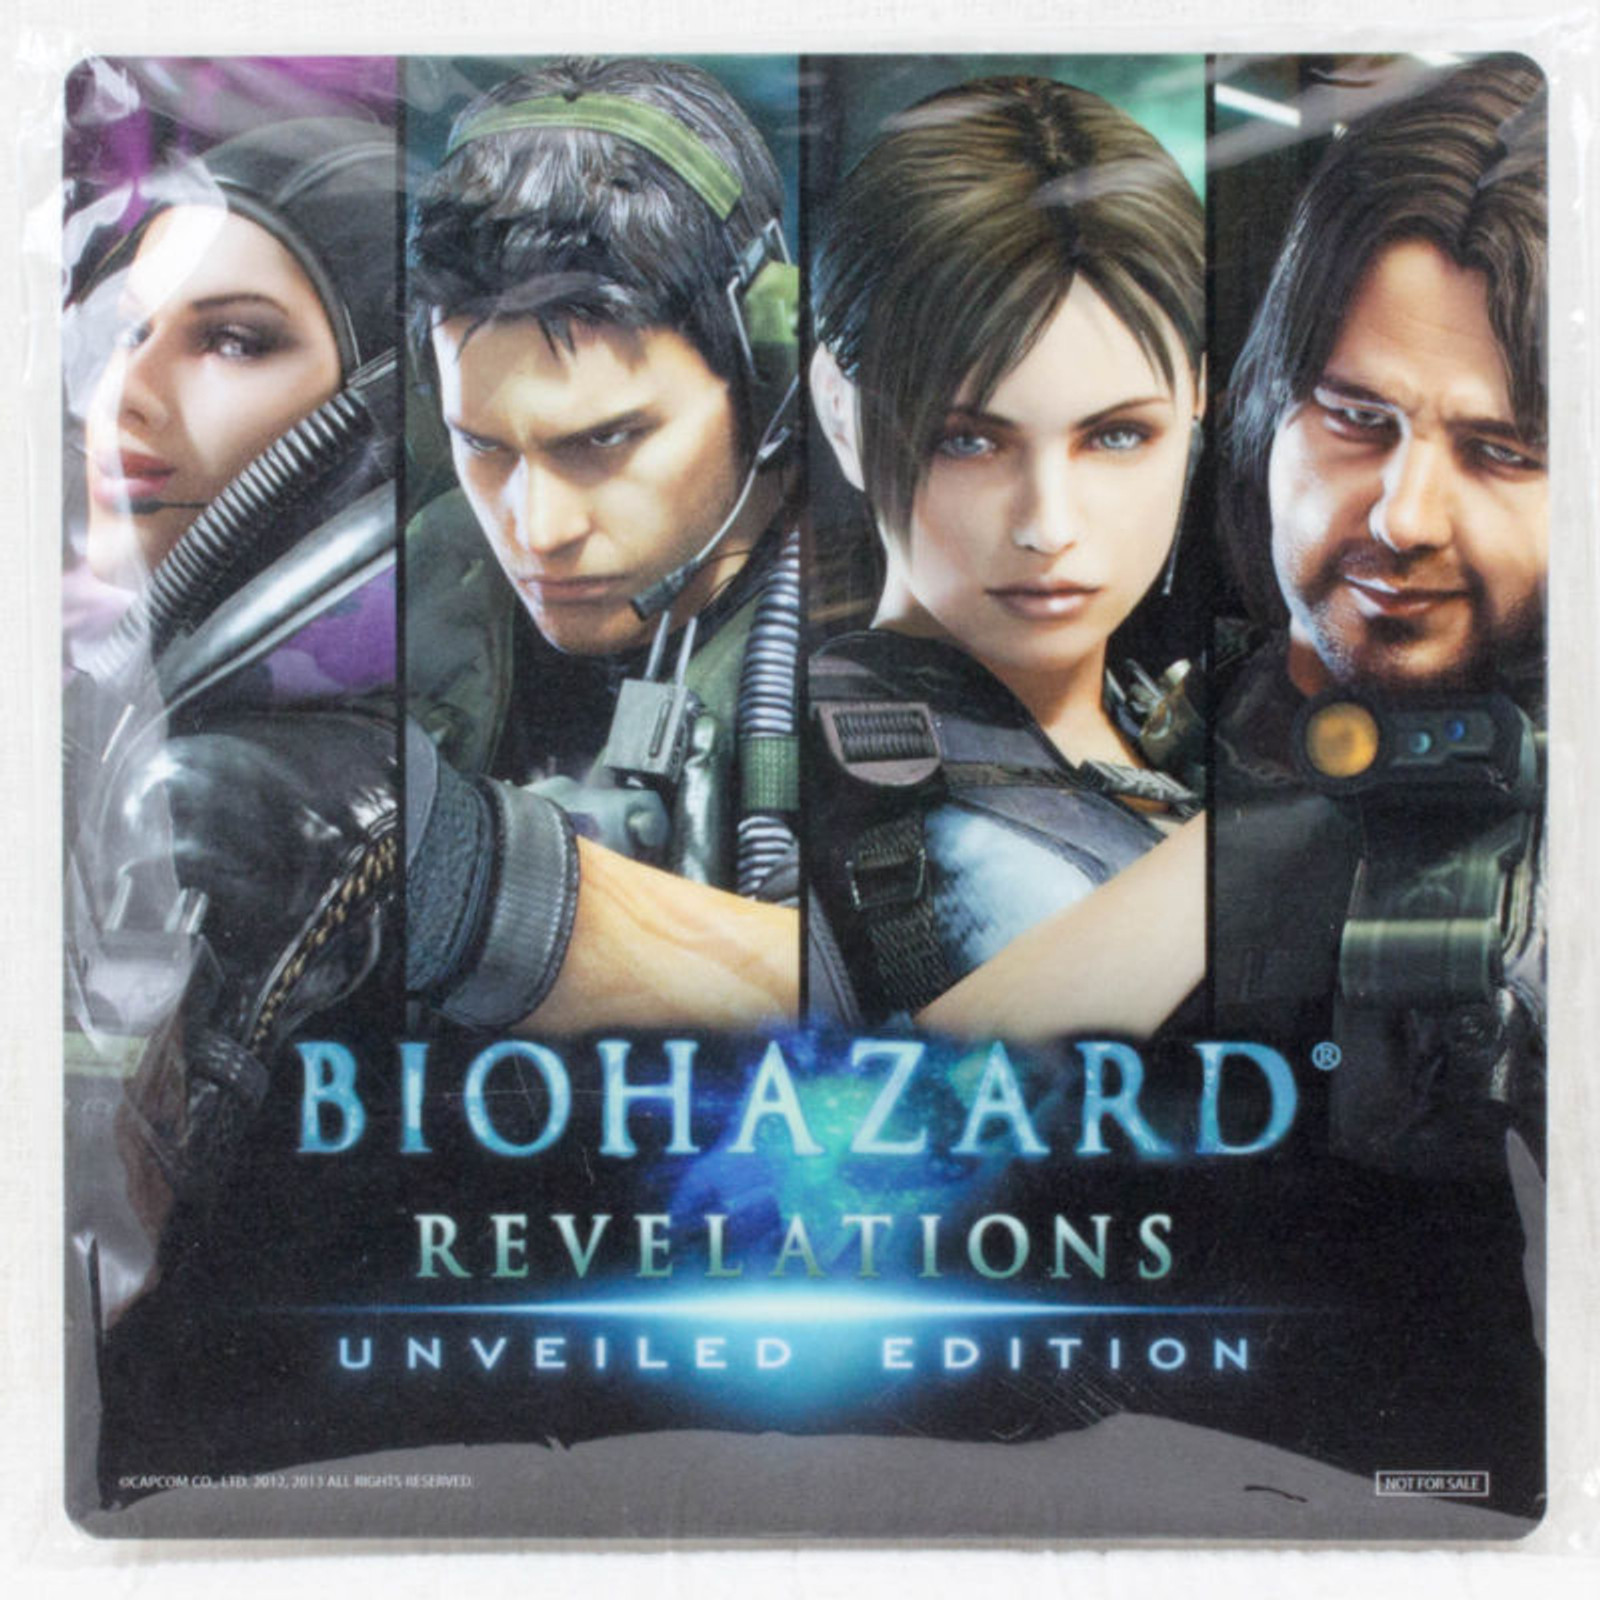 RARE RESIDENT EVIL Biohazard Revelations Mouse Pad Limted Item Capcom JAPAN GAME Resident Evil